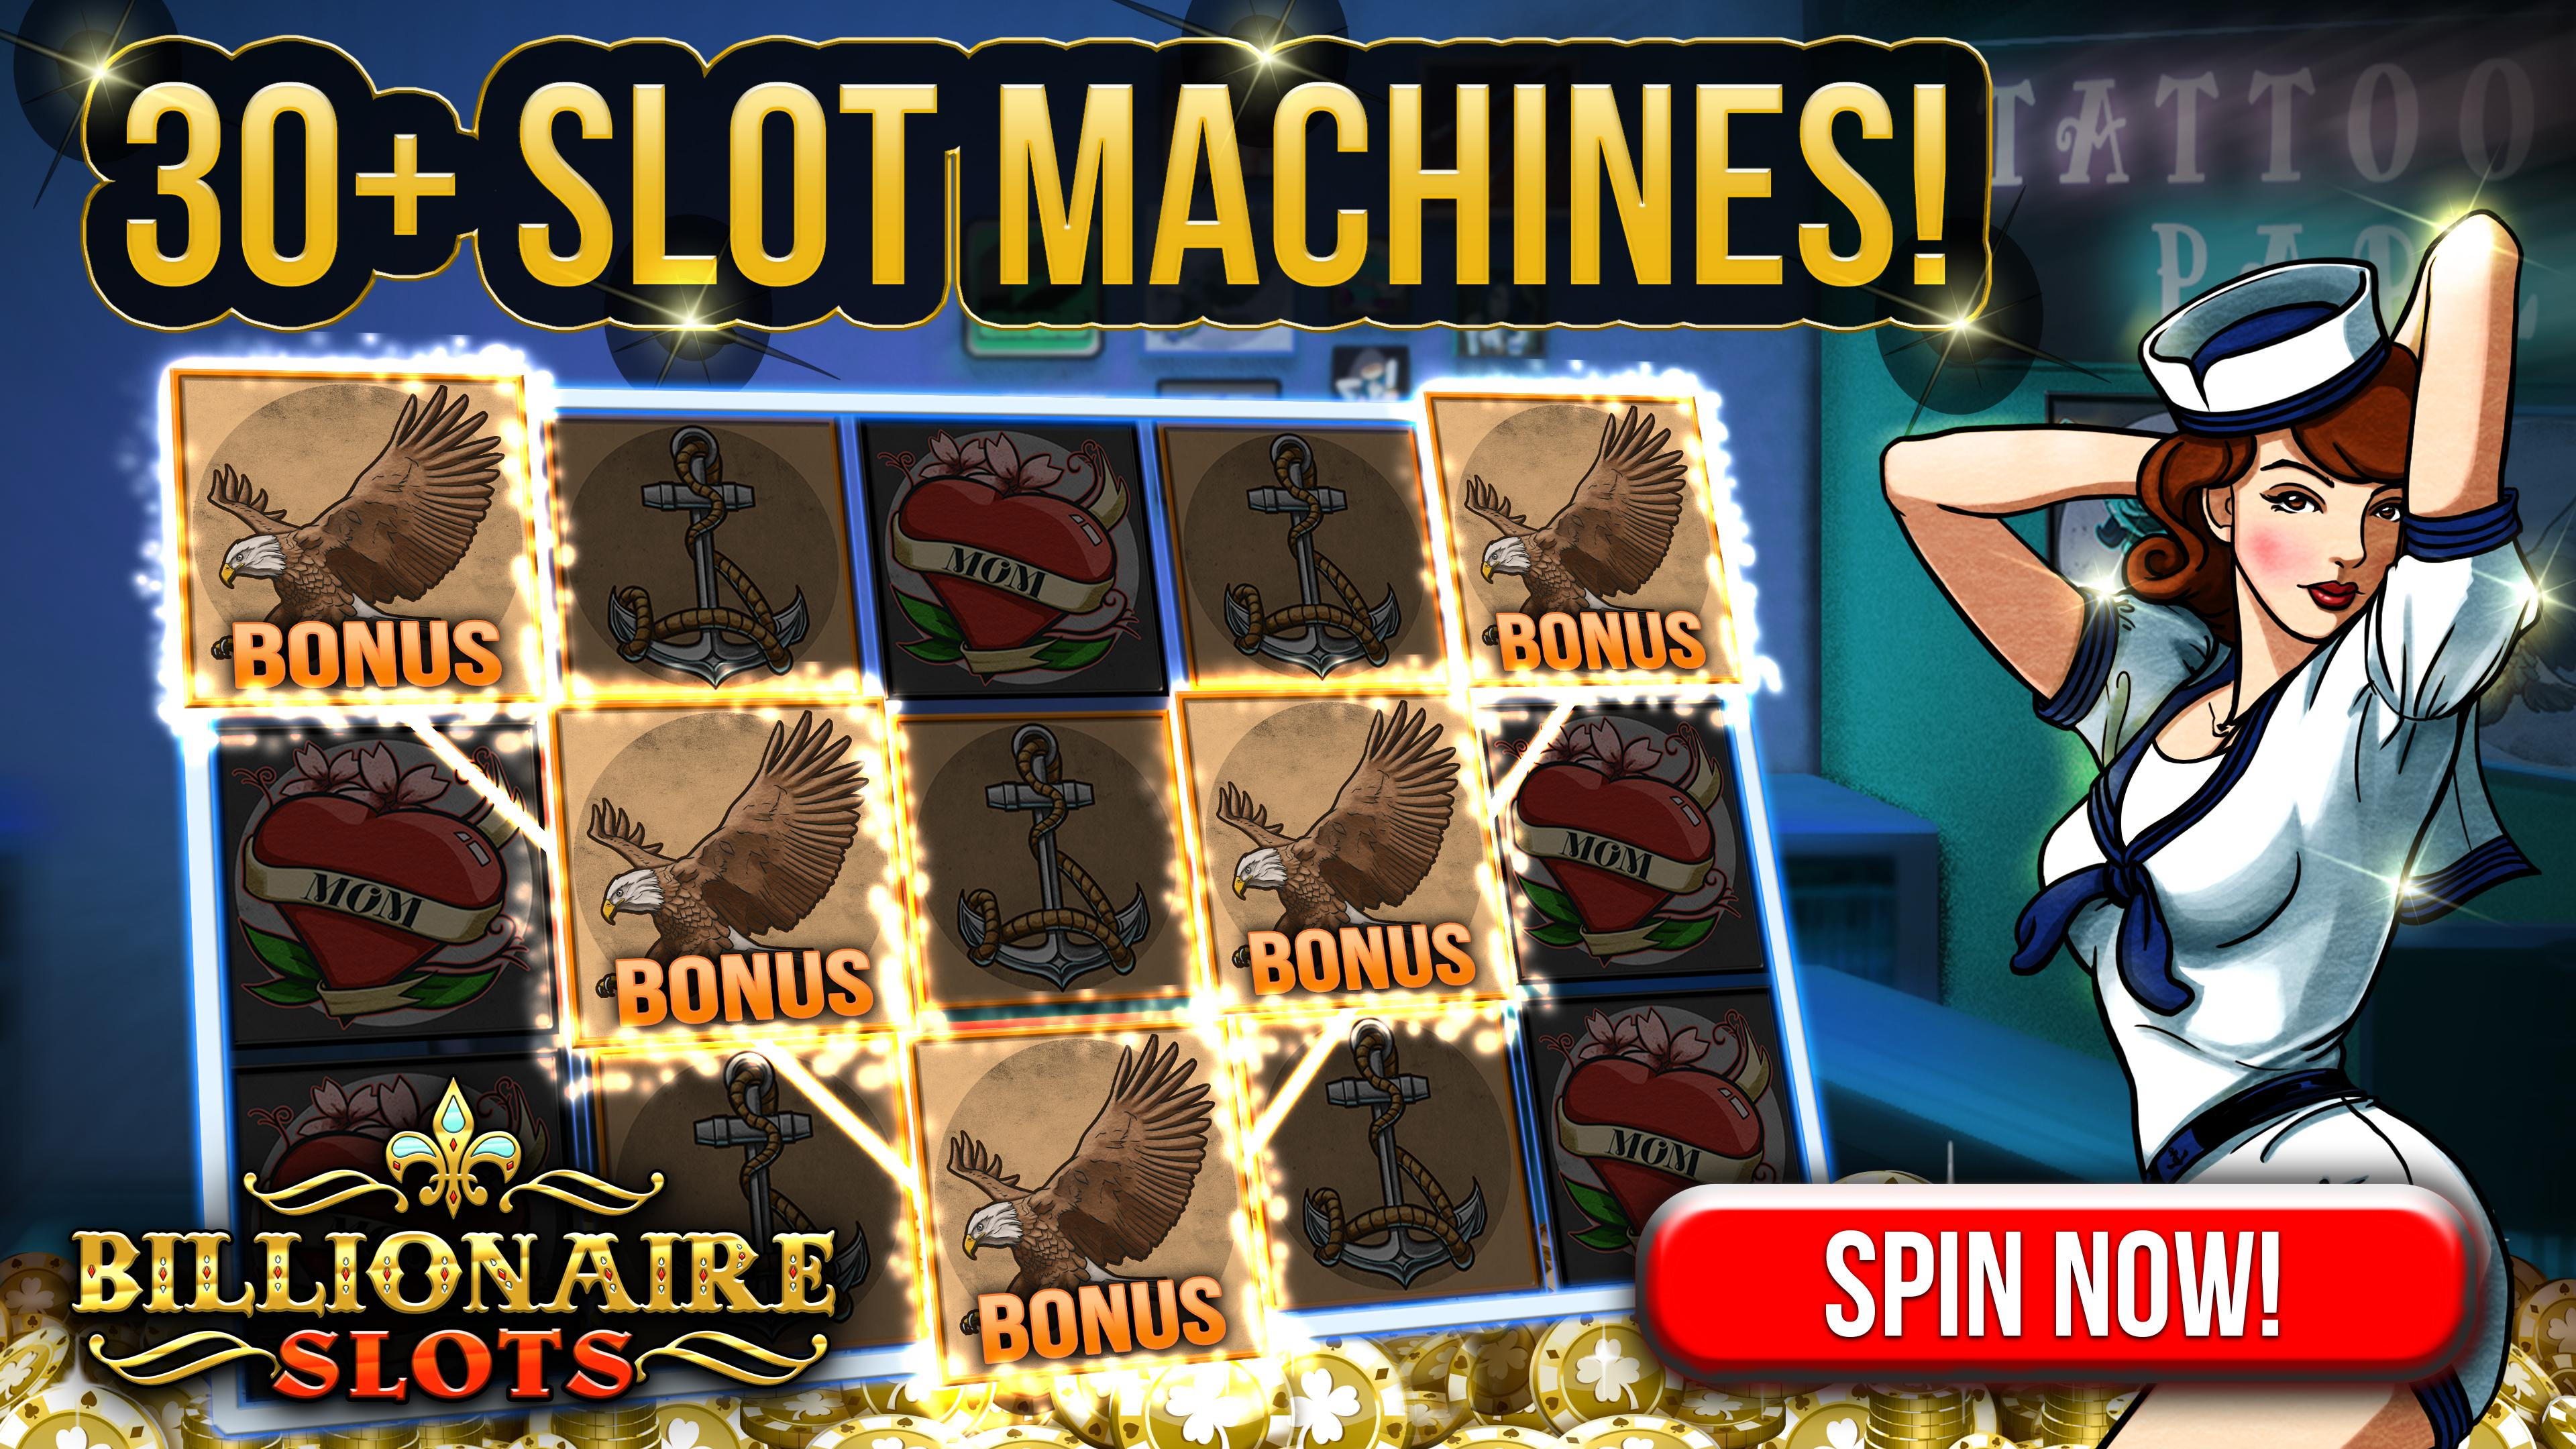 Slots Billionaire Free Slots Casino Games Offline Apk 1 130